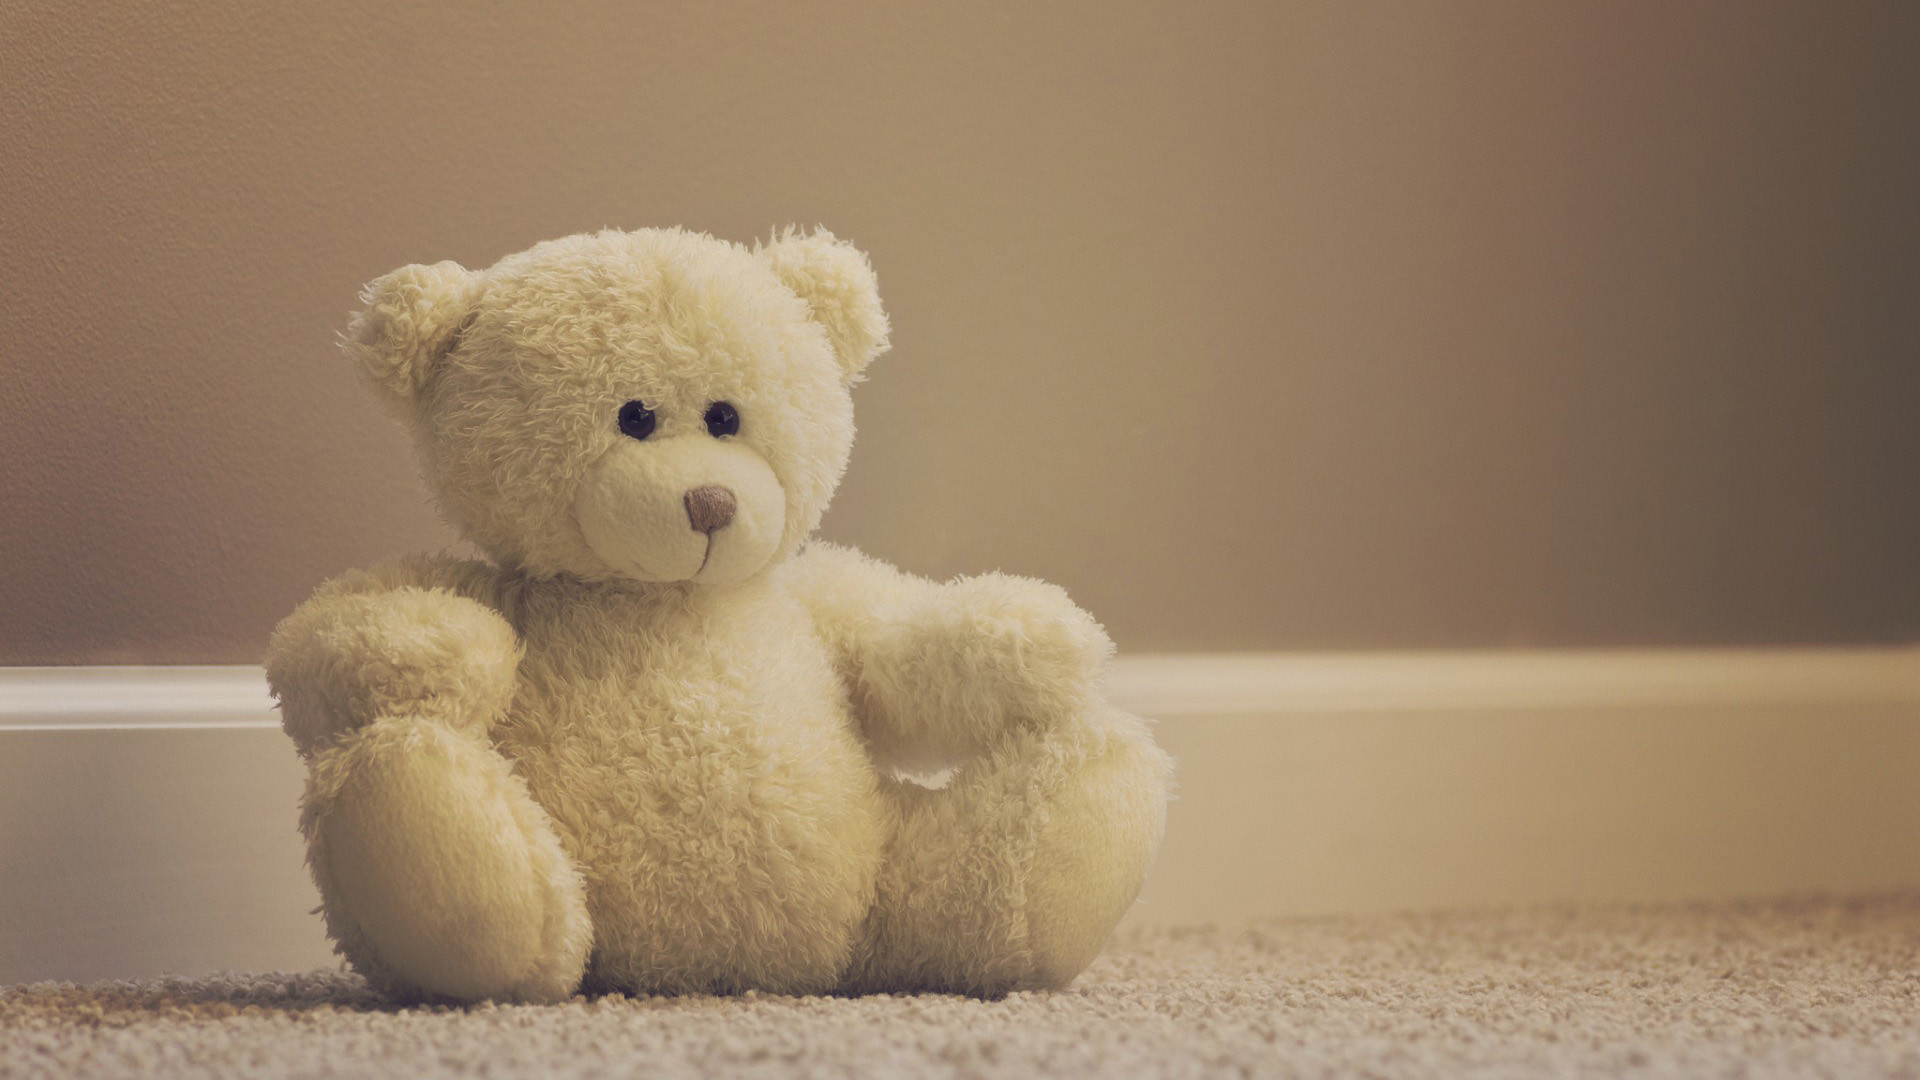 Cute Teddy Bear Wallpapers Wallpapertag